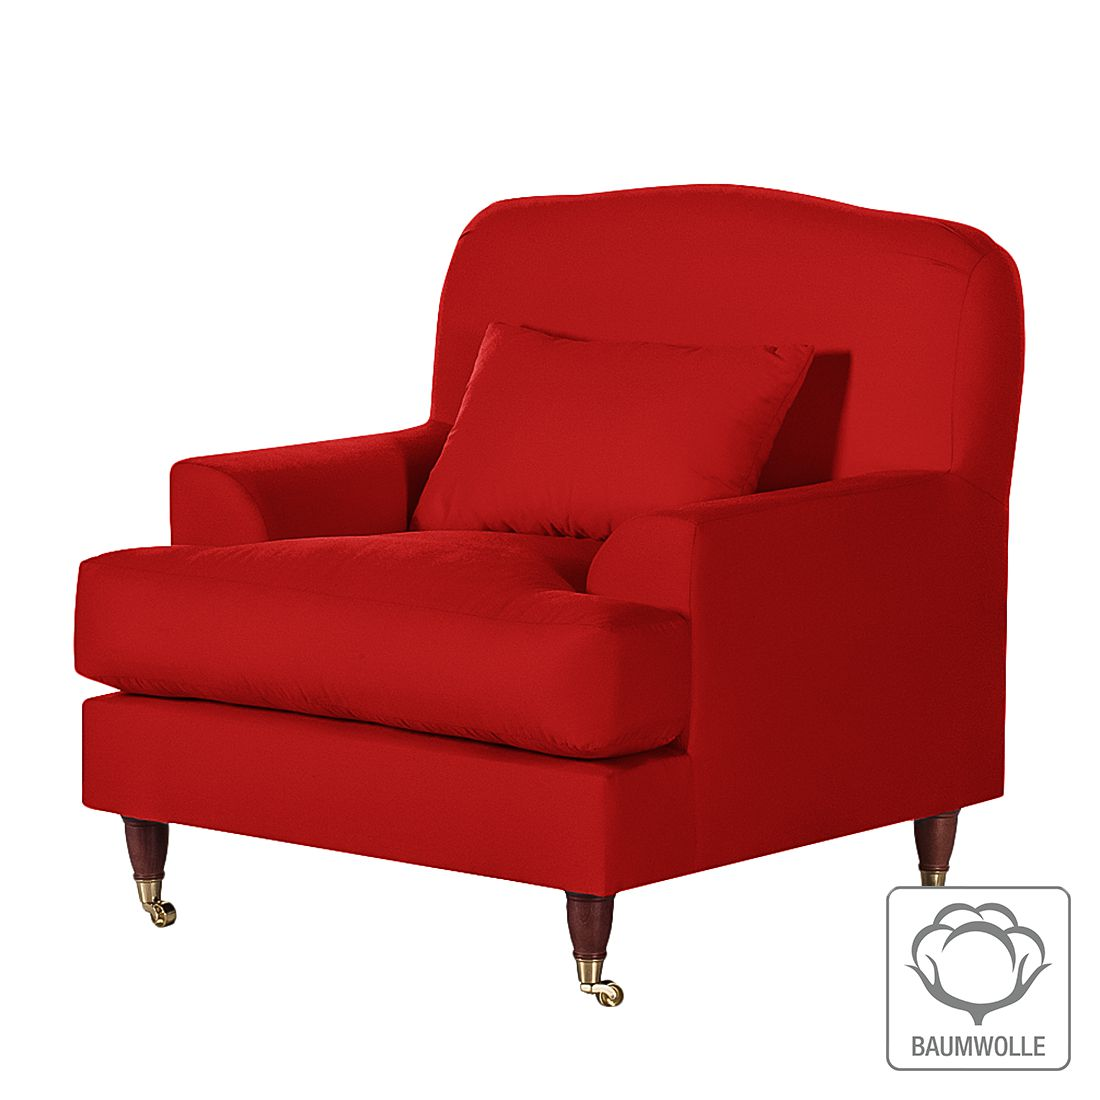 Sessel Bent – Baumwollstoff Rot, Maison Belfort günstig bestellen